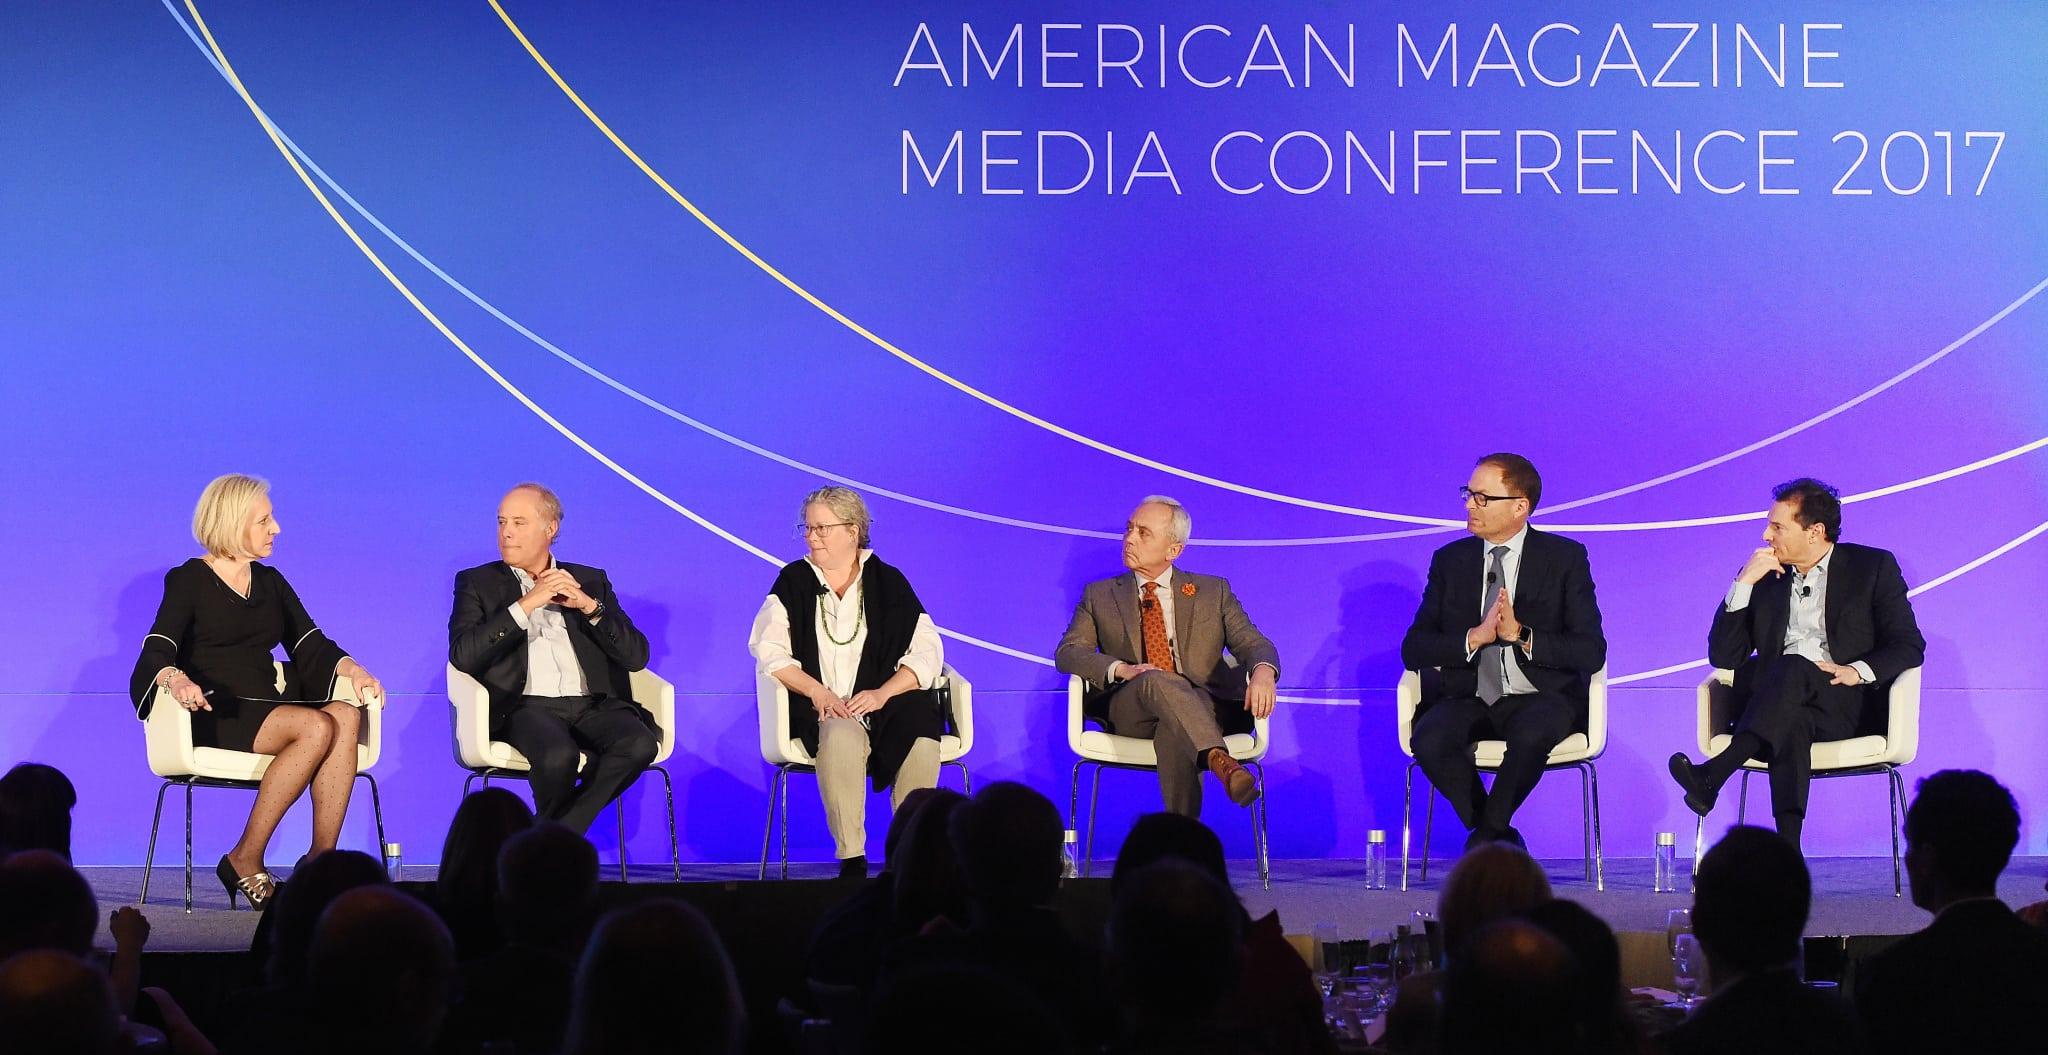 American Magazine Media Conference 2017